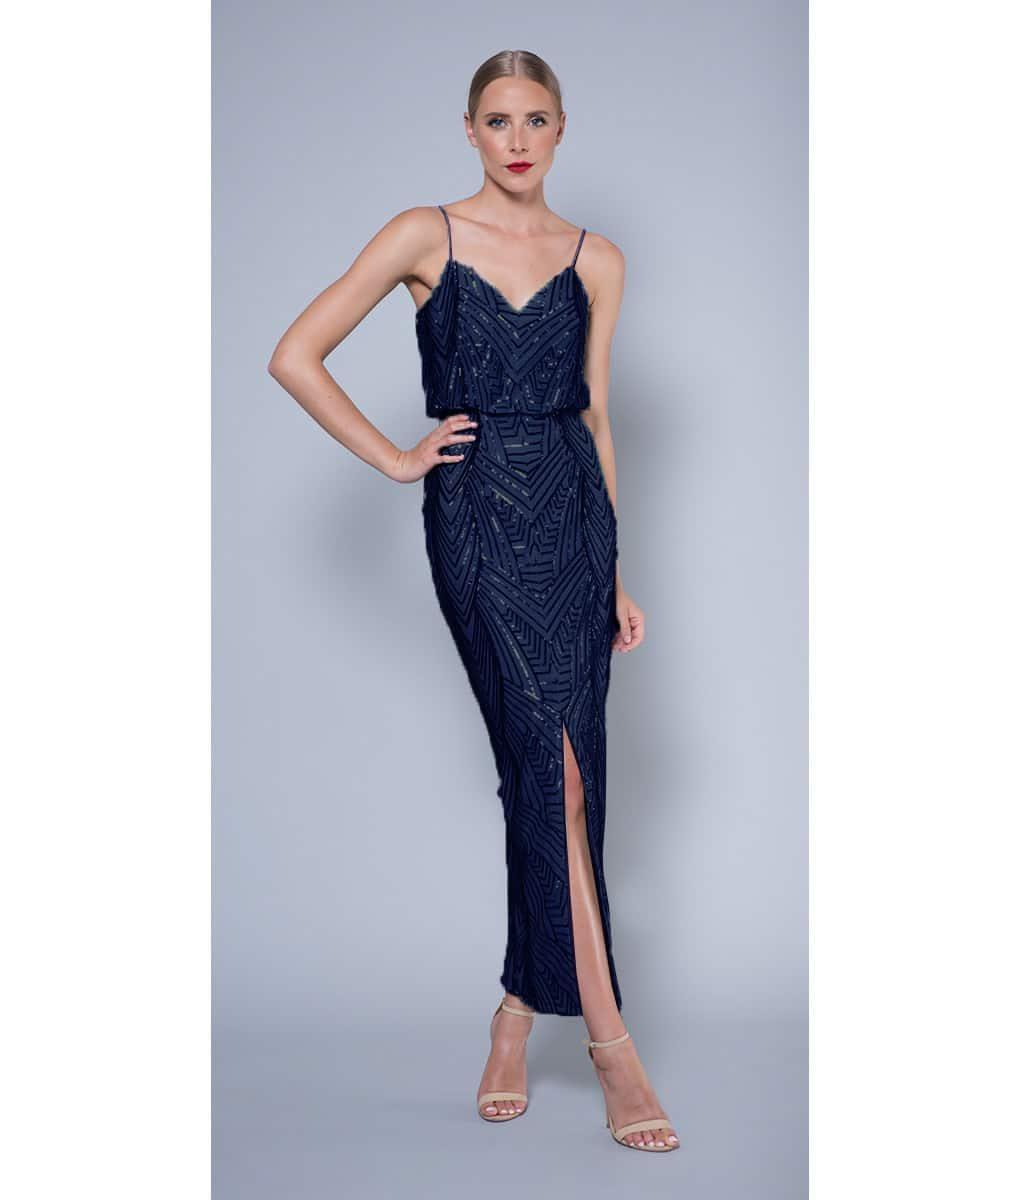 Alila-Navy-sequin-evening-dress-Lumier-Bariano